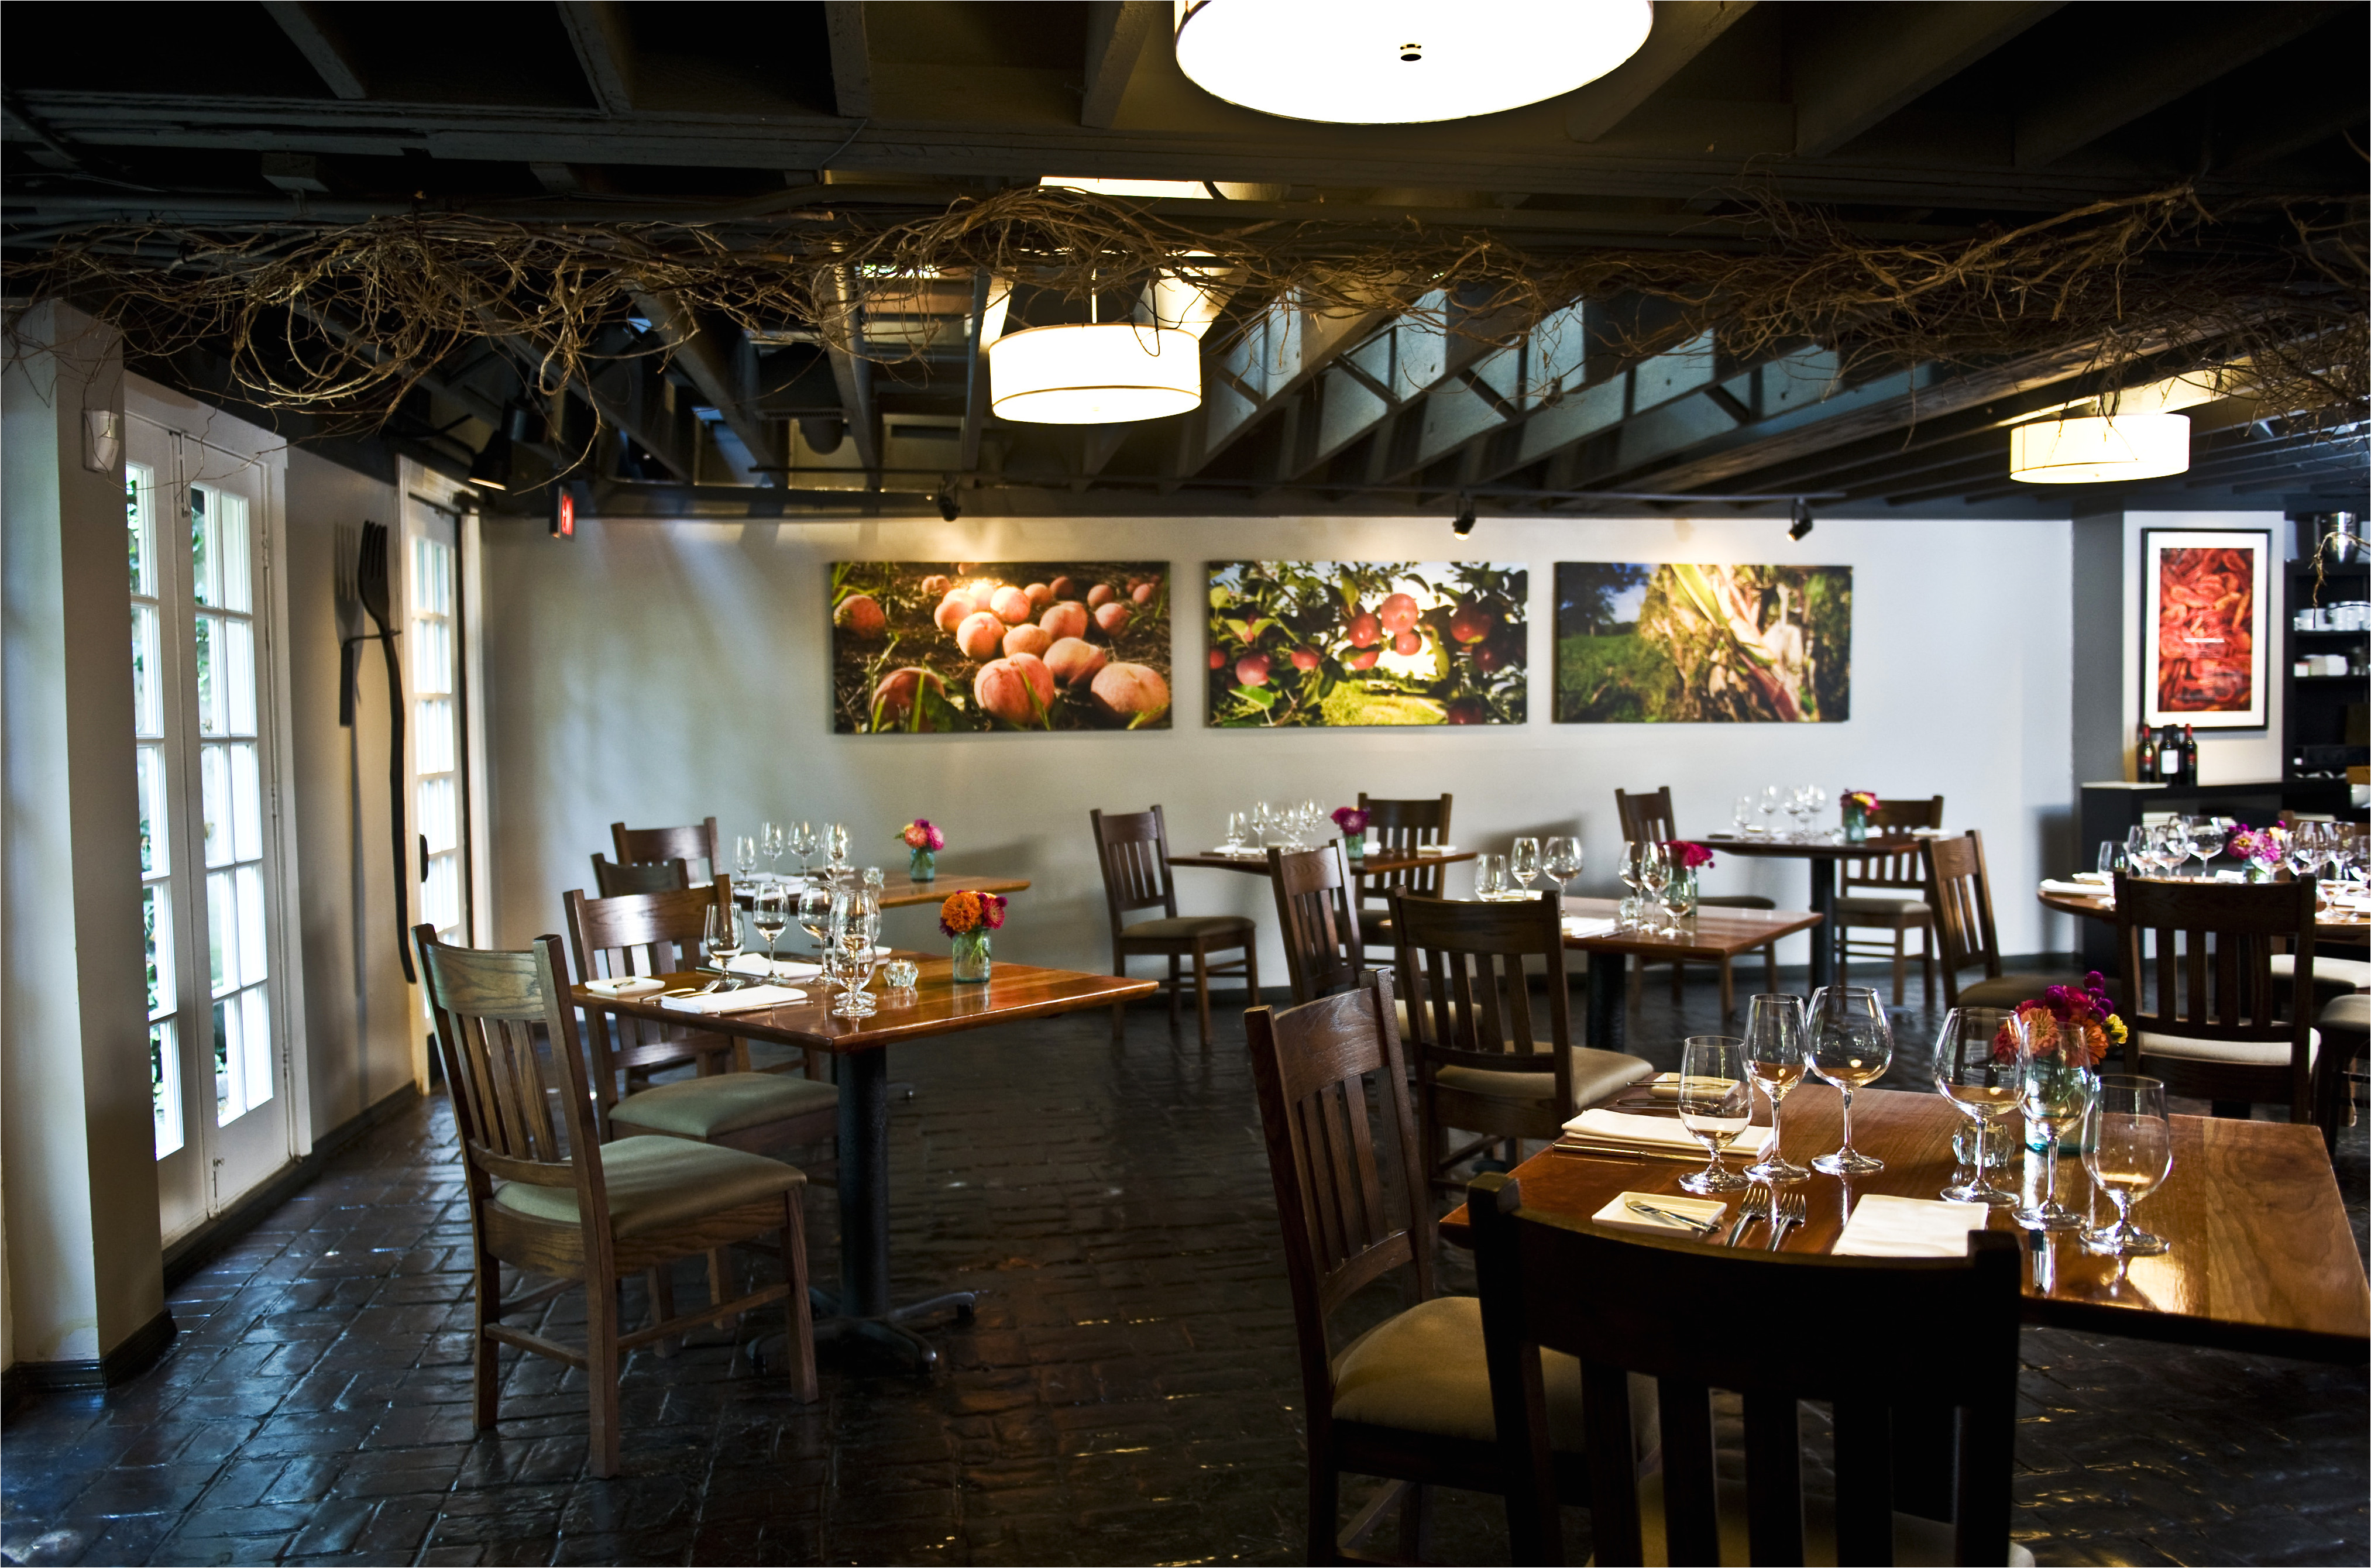 170424103826 louisville 610 magnolia restaurant jpg